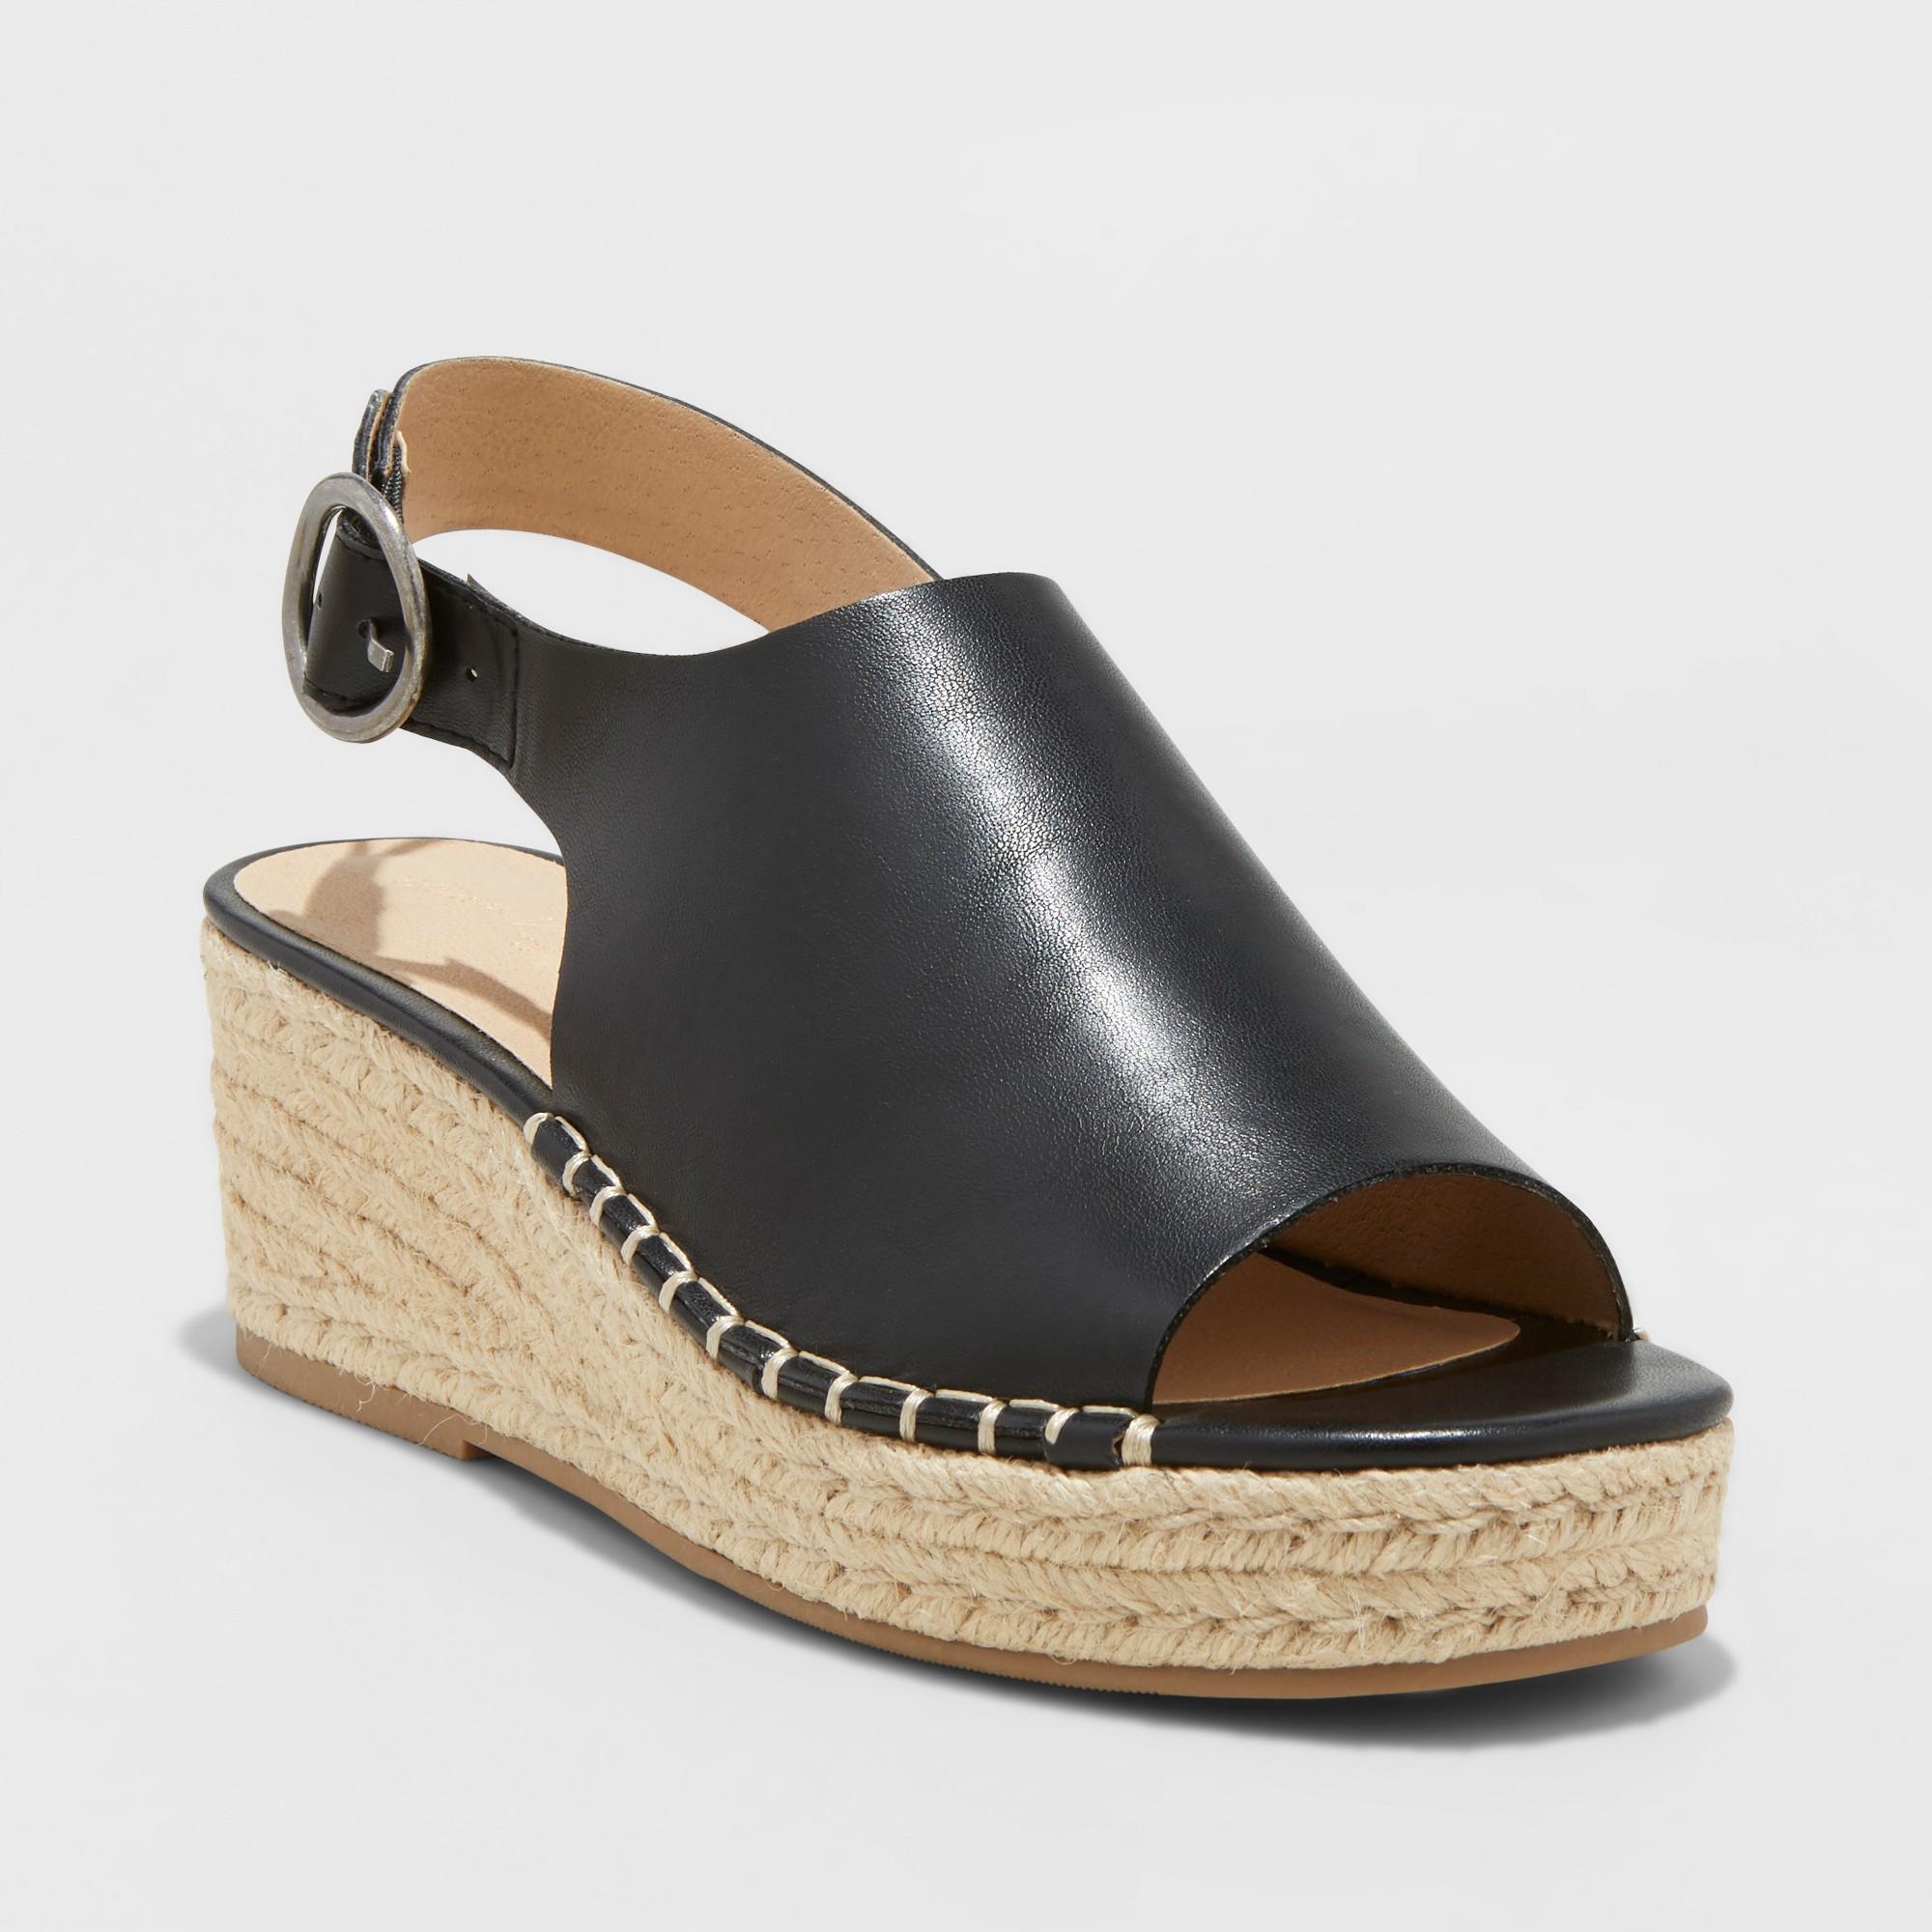 24c630492f1 Women s Ava Shield Espadrille Flatform Sandals - Universal Thread Black 8.5